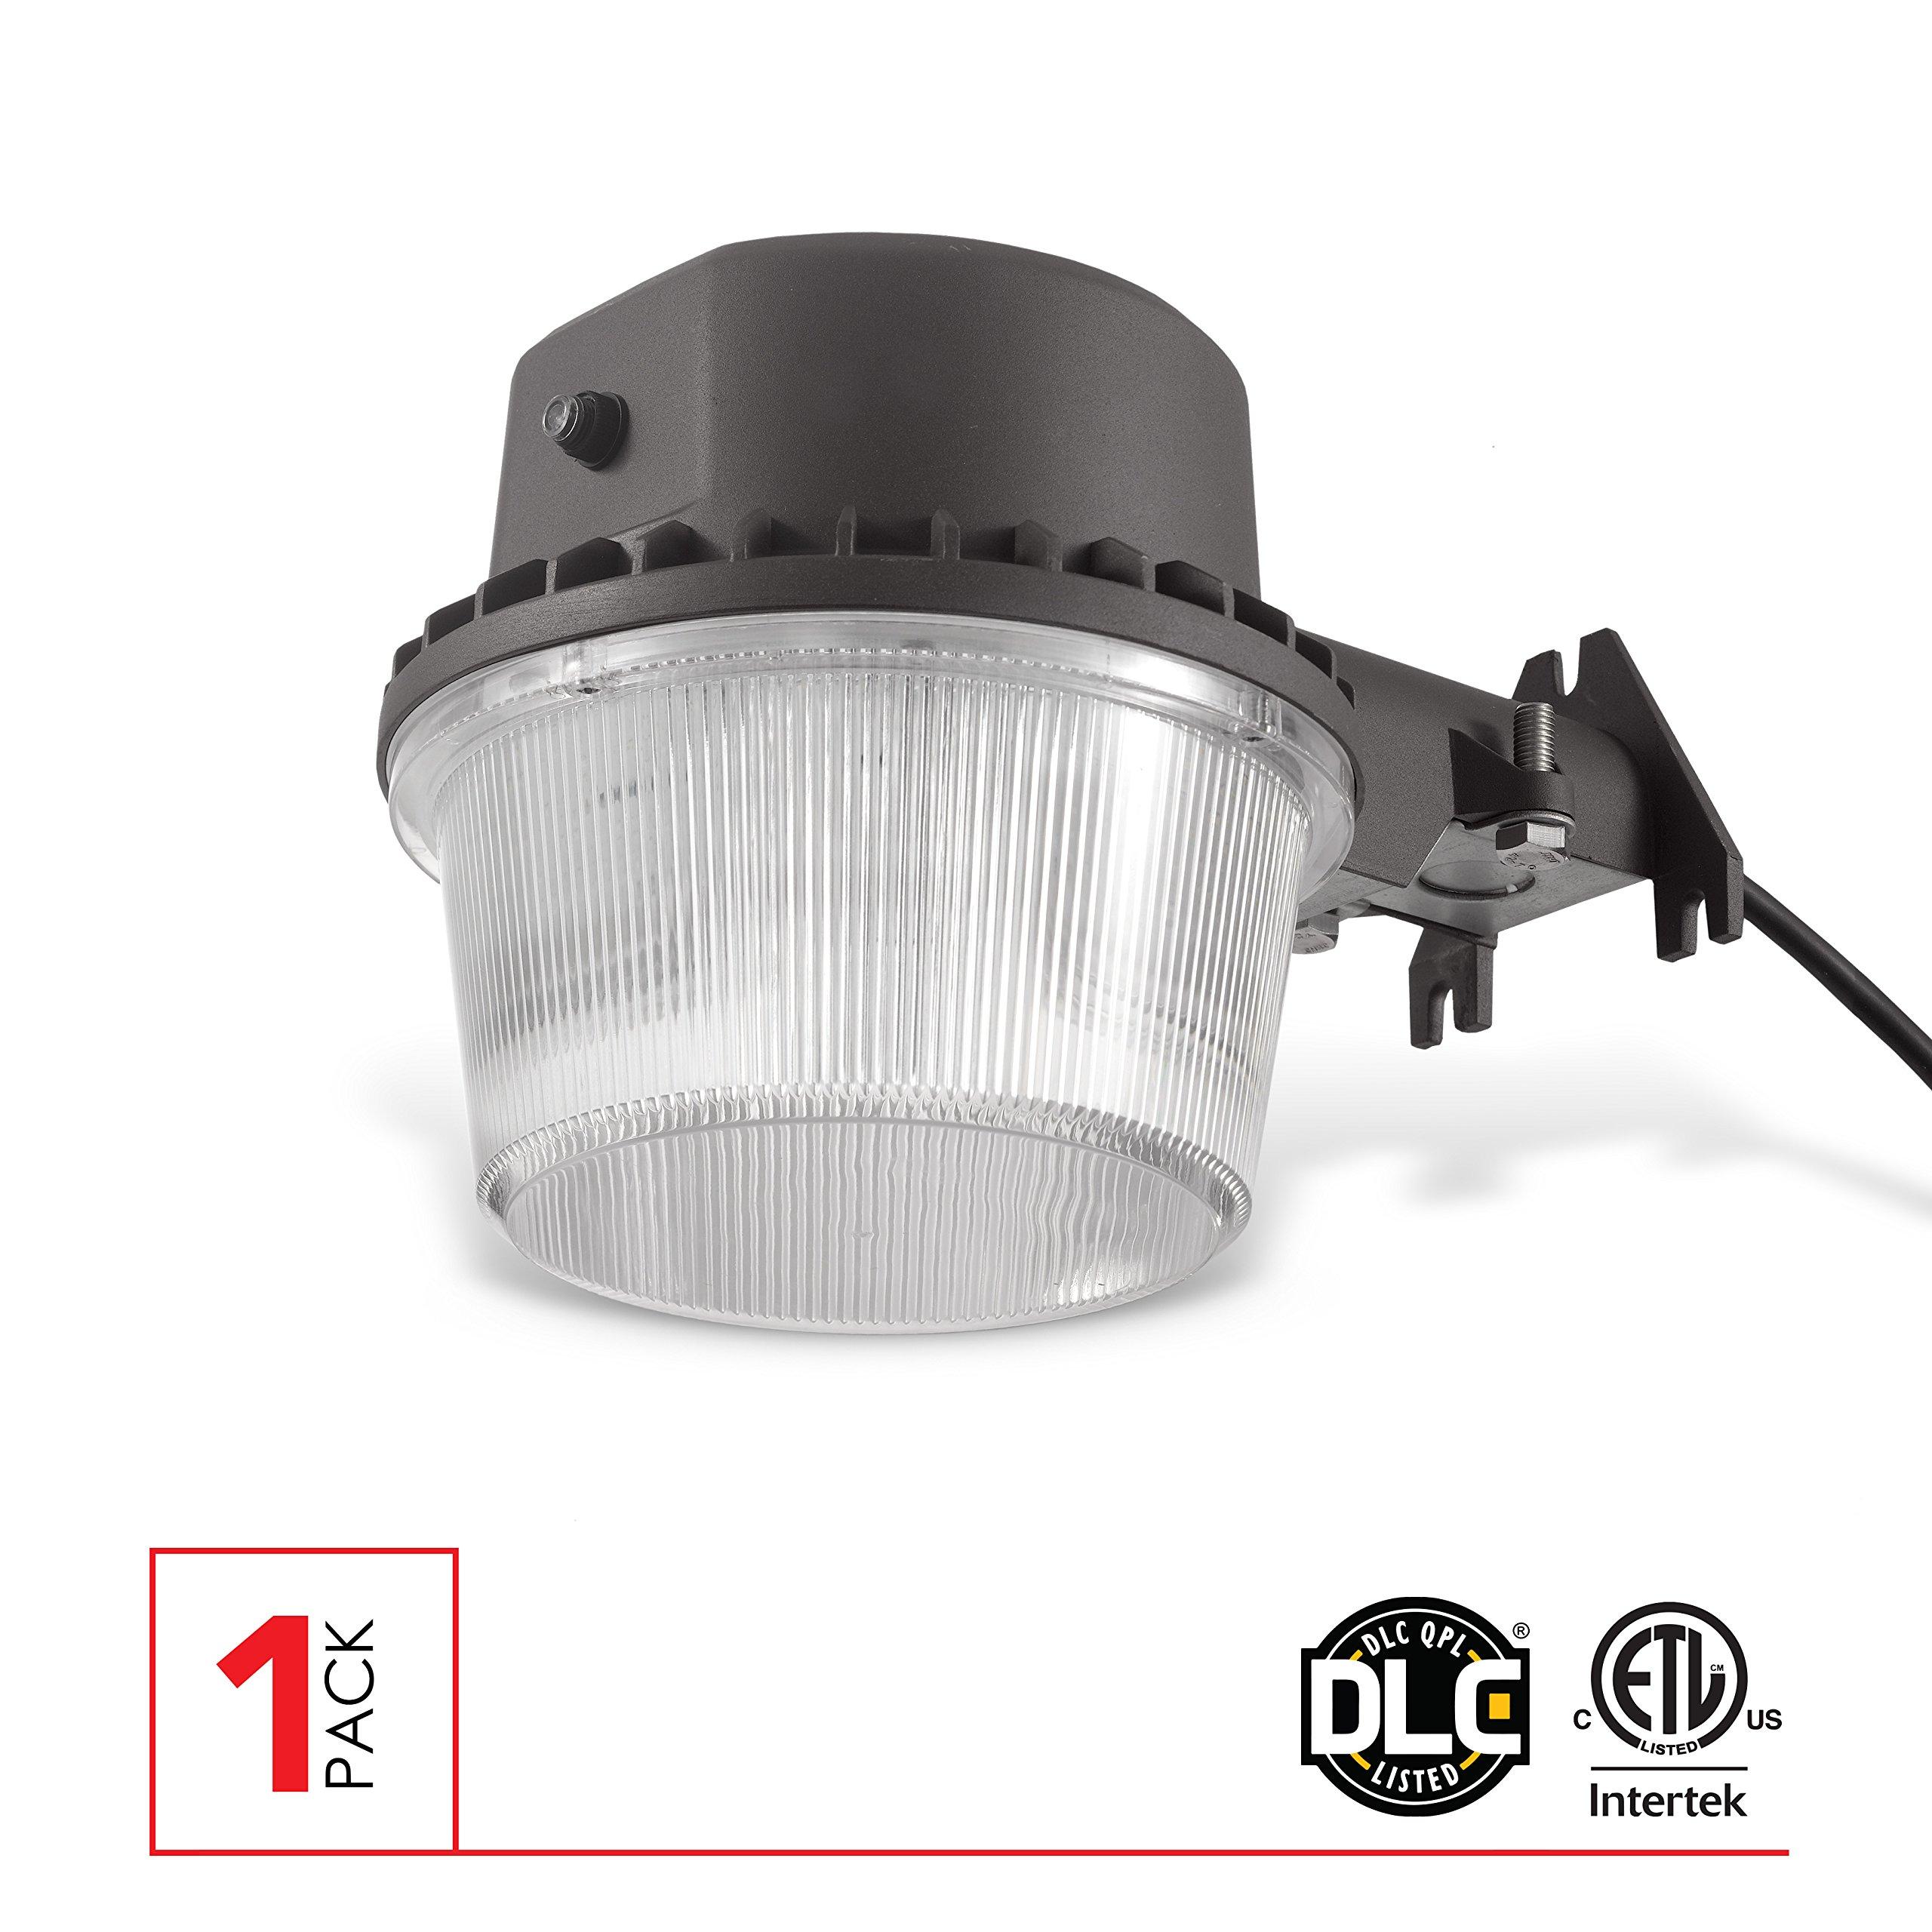 LED Dusk-To-Dawn Barn Light Outdoor Flood Light With Photocell, 35W, 3500 Lumens, 5000K, CRI 80, IP65, ETL-DLC 4.0 Listed, 1 Pack.